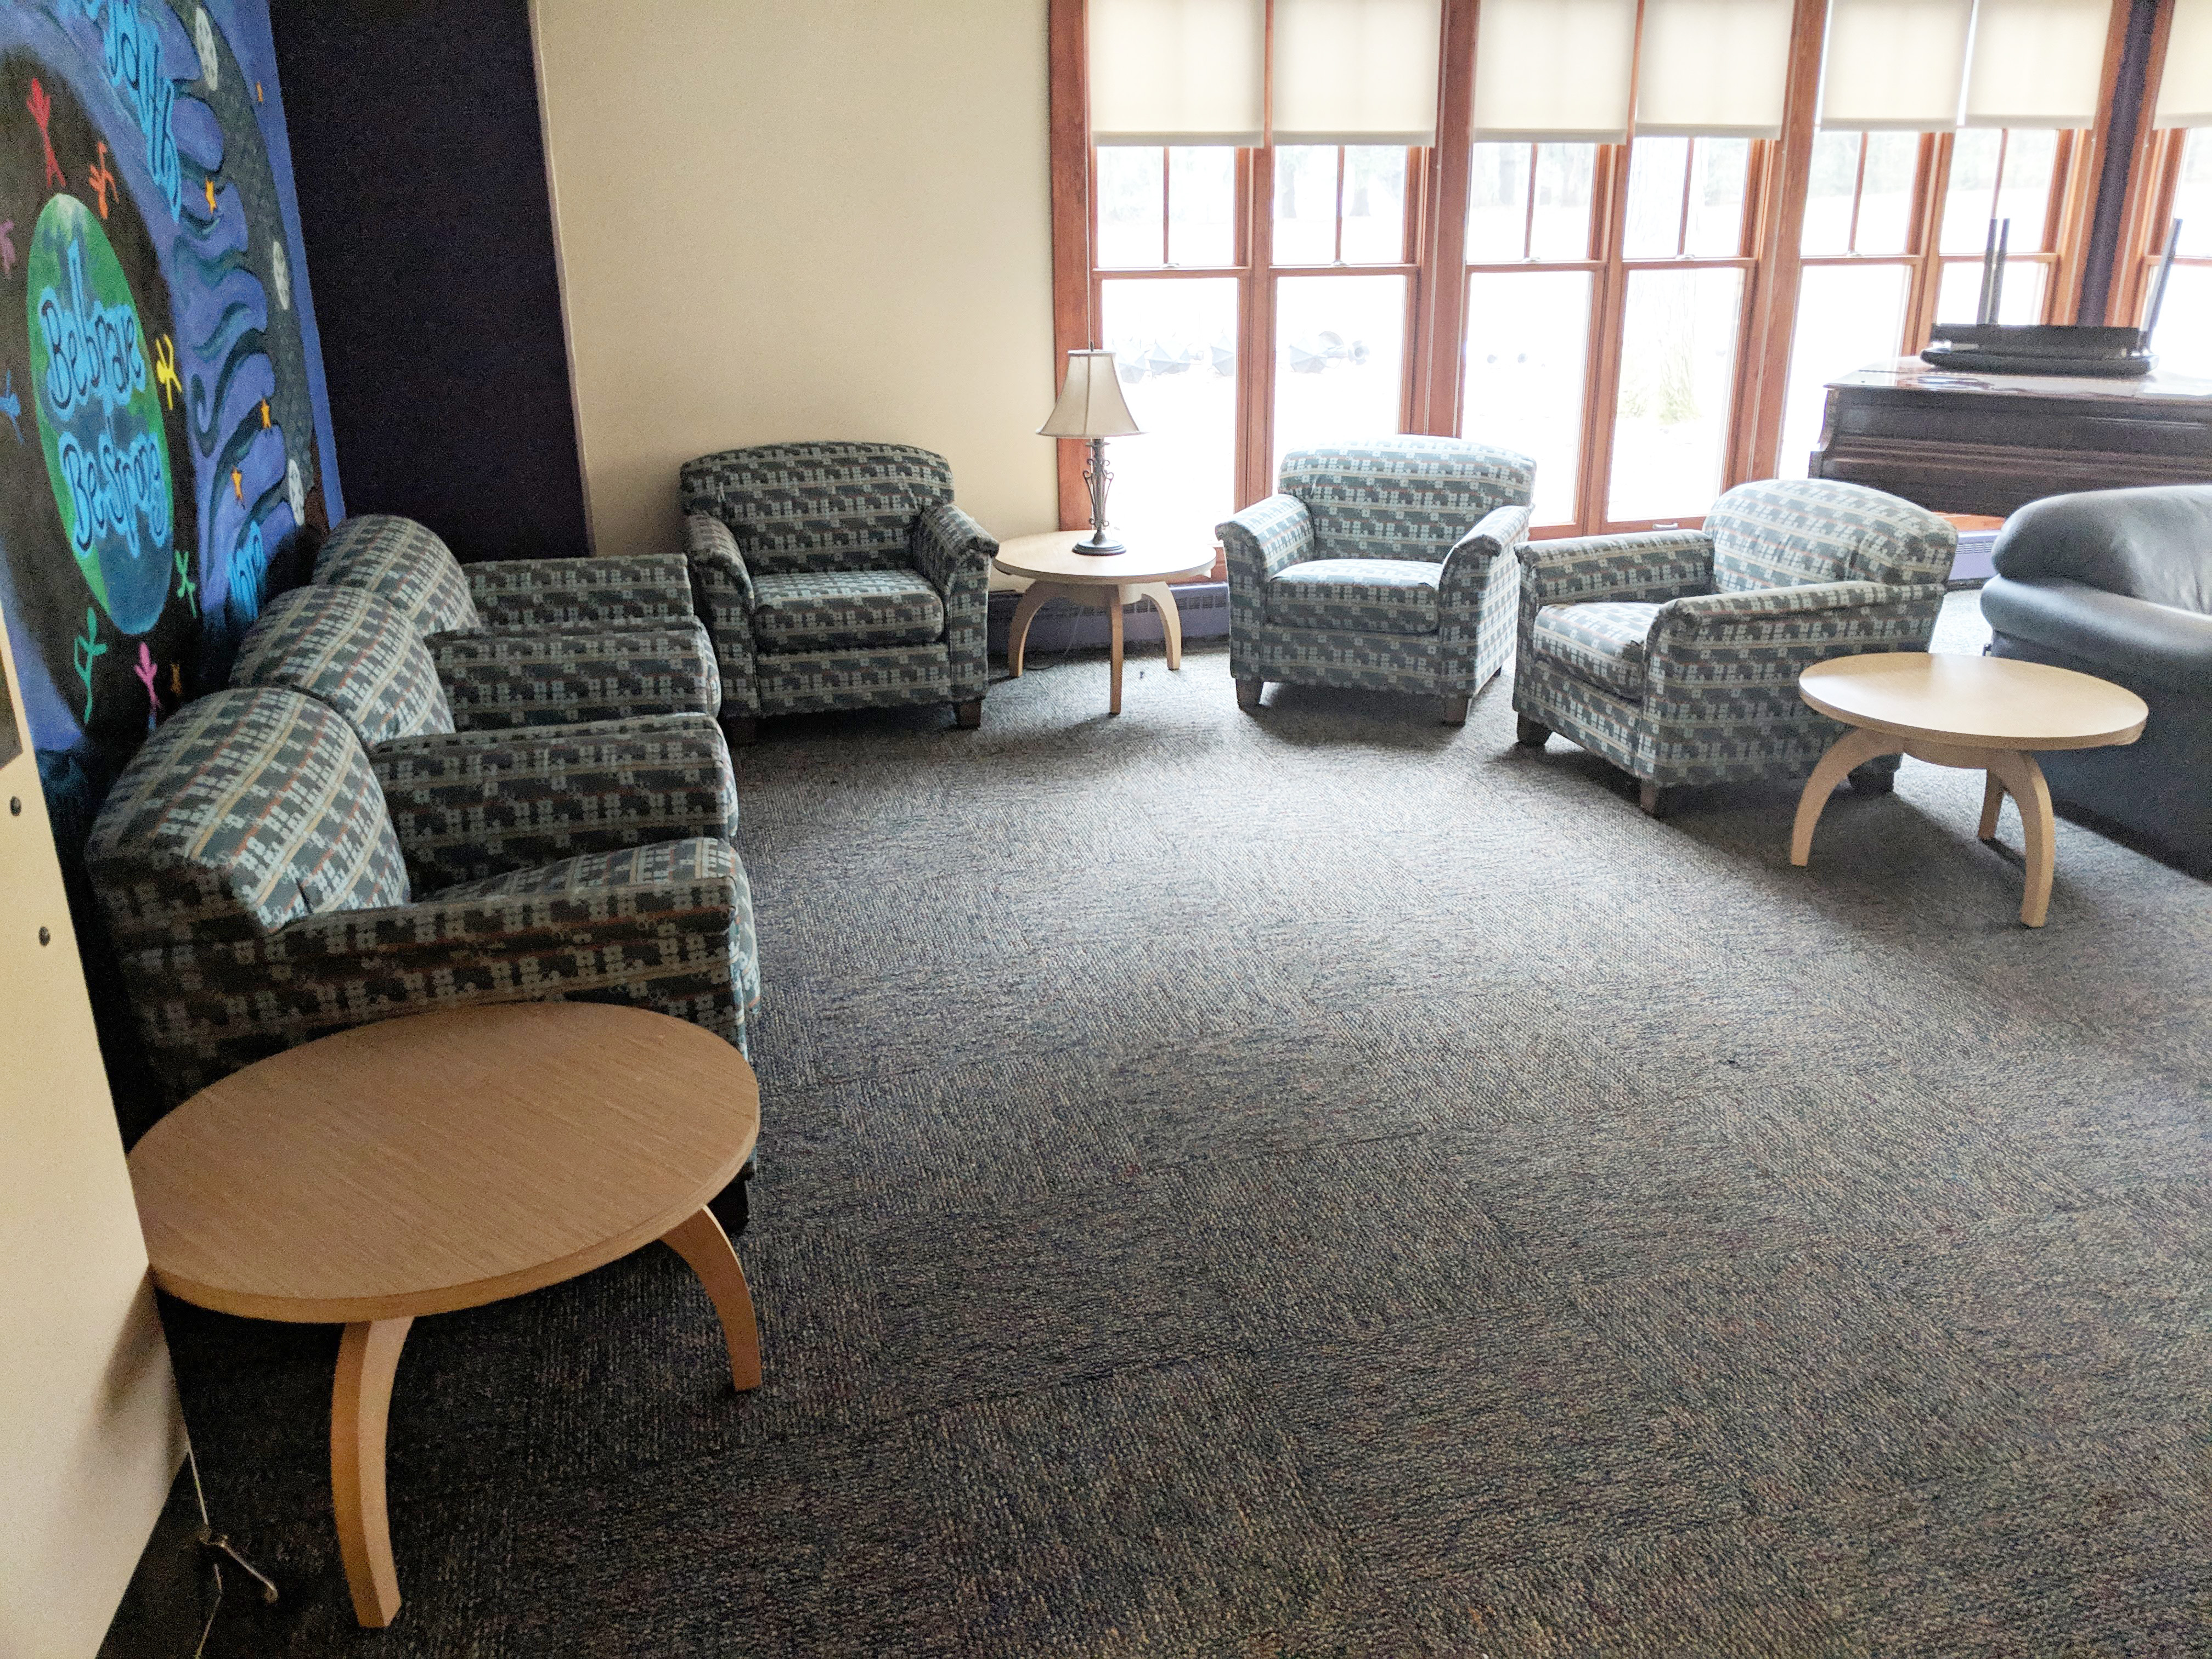 Grant Hall lounge